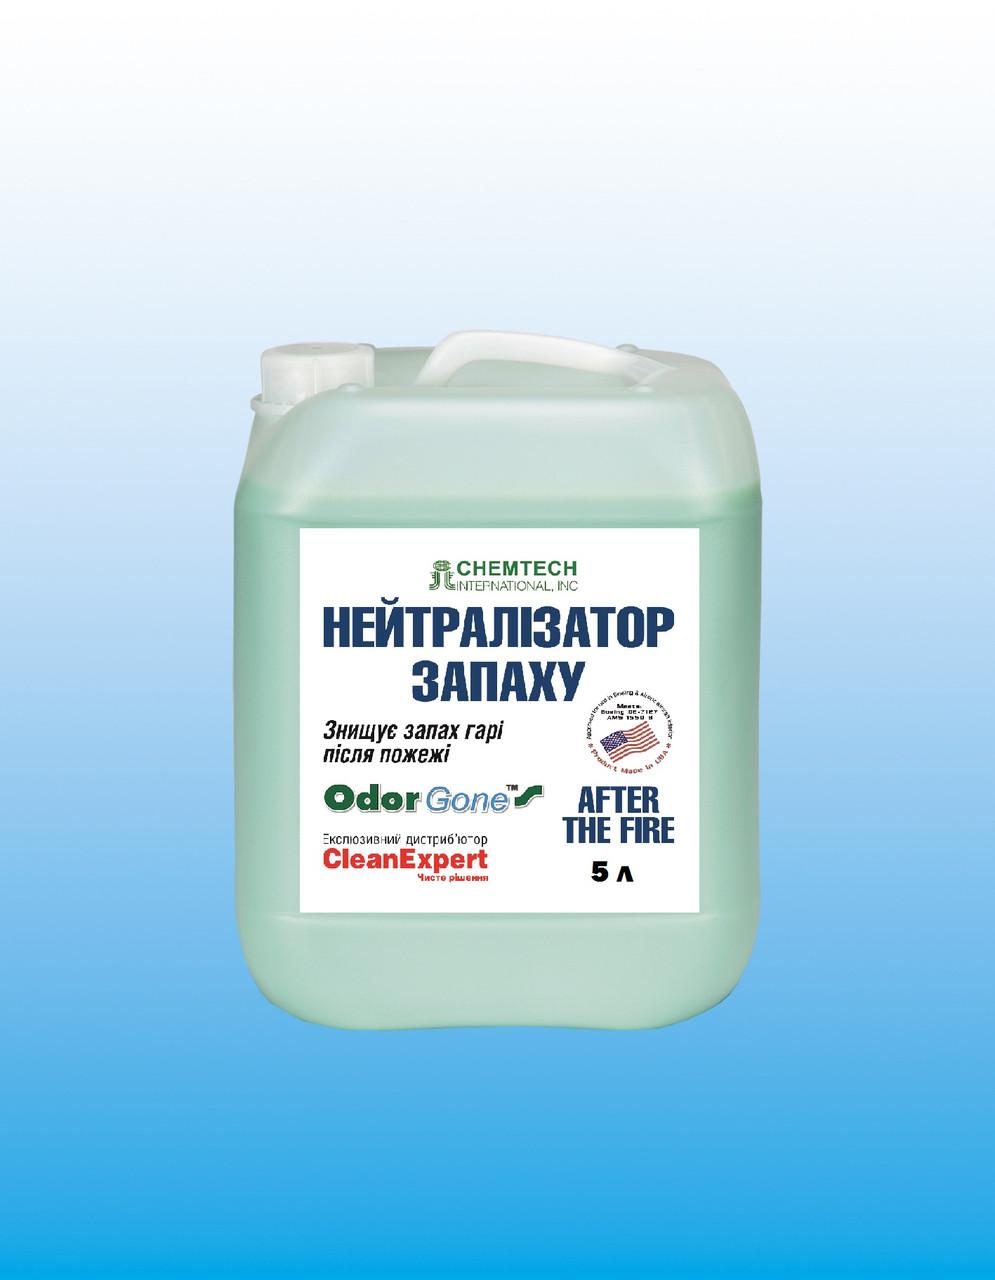 Нейтралізатор неприємного запаху Chemtech international Odorgone After The Fire 5 л. (Після пожежний Одоргон)